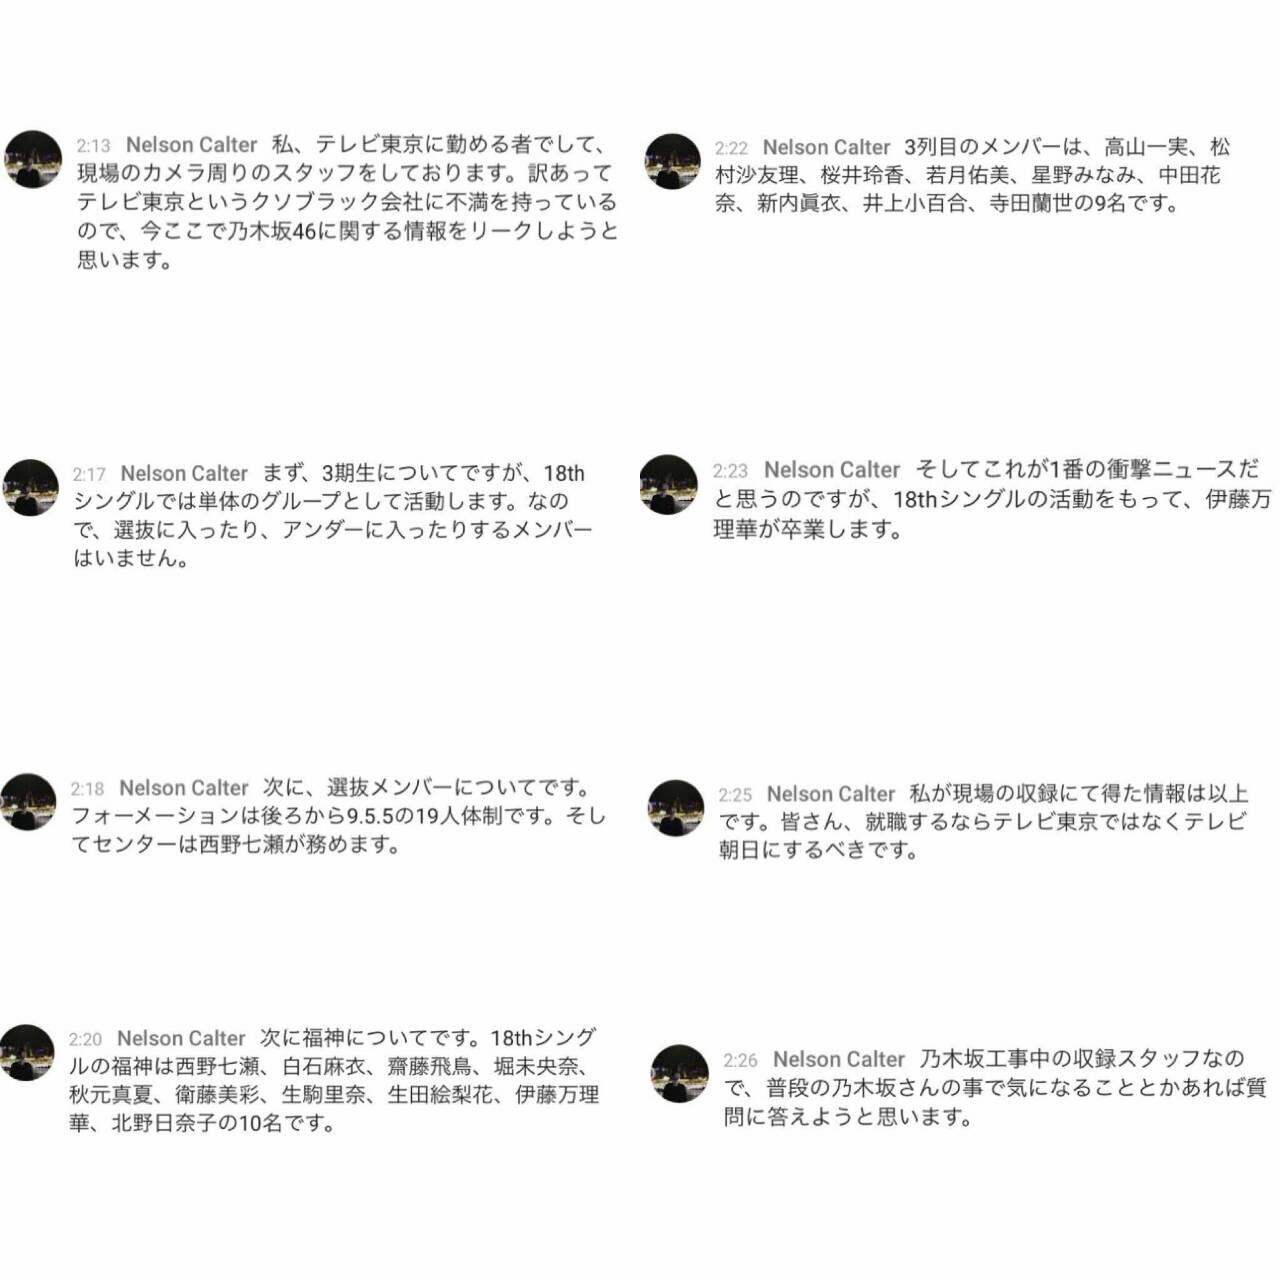 乃木坂46 Nelson Calter3